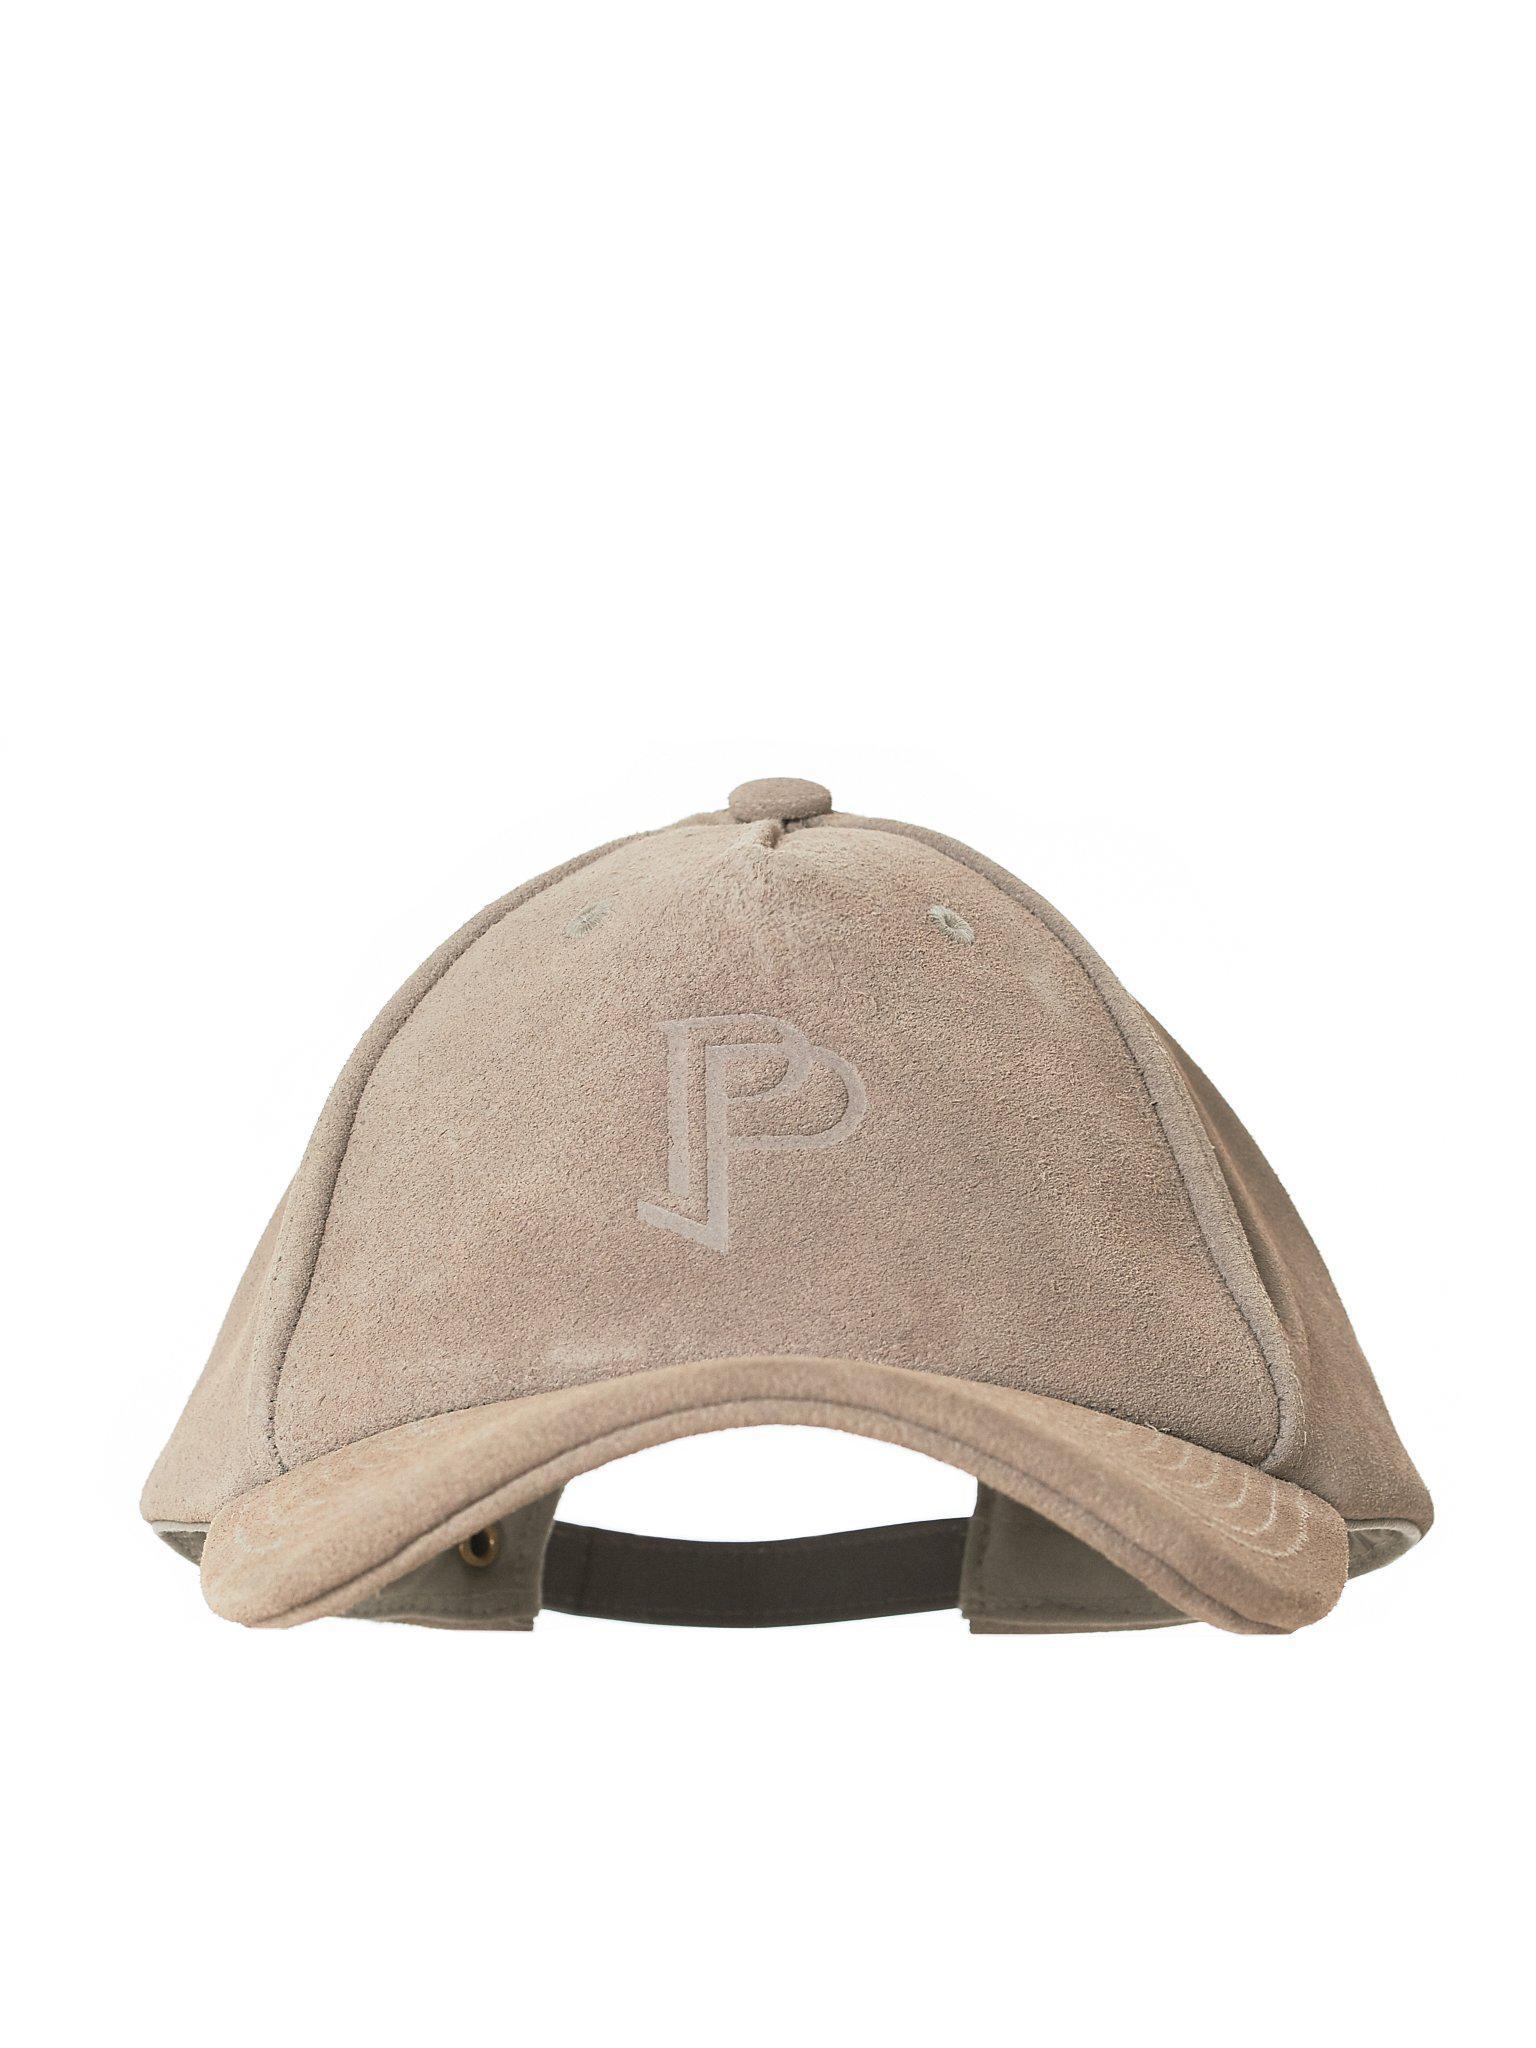 9669dbcc06c Lyst - adidas Paul Pogba Suede Cap for Men